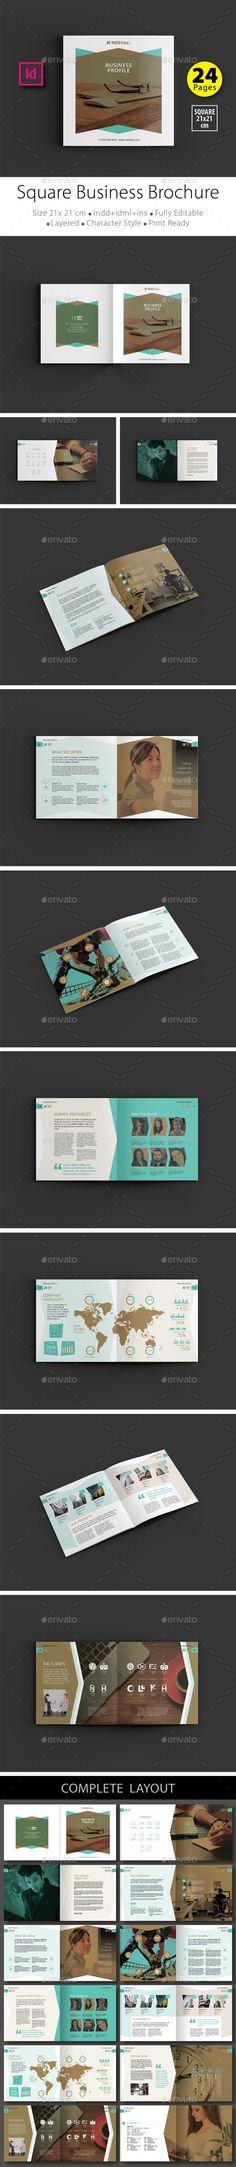 21 x 21 cm, Square Business Brochure Design Template V.2 - Brochures Print Templates, InDesign (INDD). Download link : http://graphicriver.net/item/square-business-brochure-design-template-v2/16361215?ref=marlakk